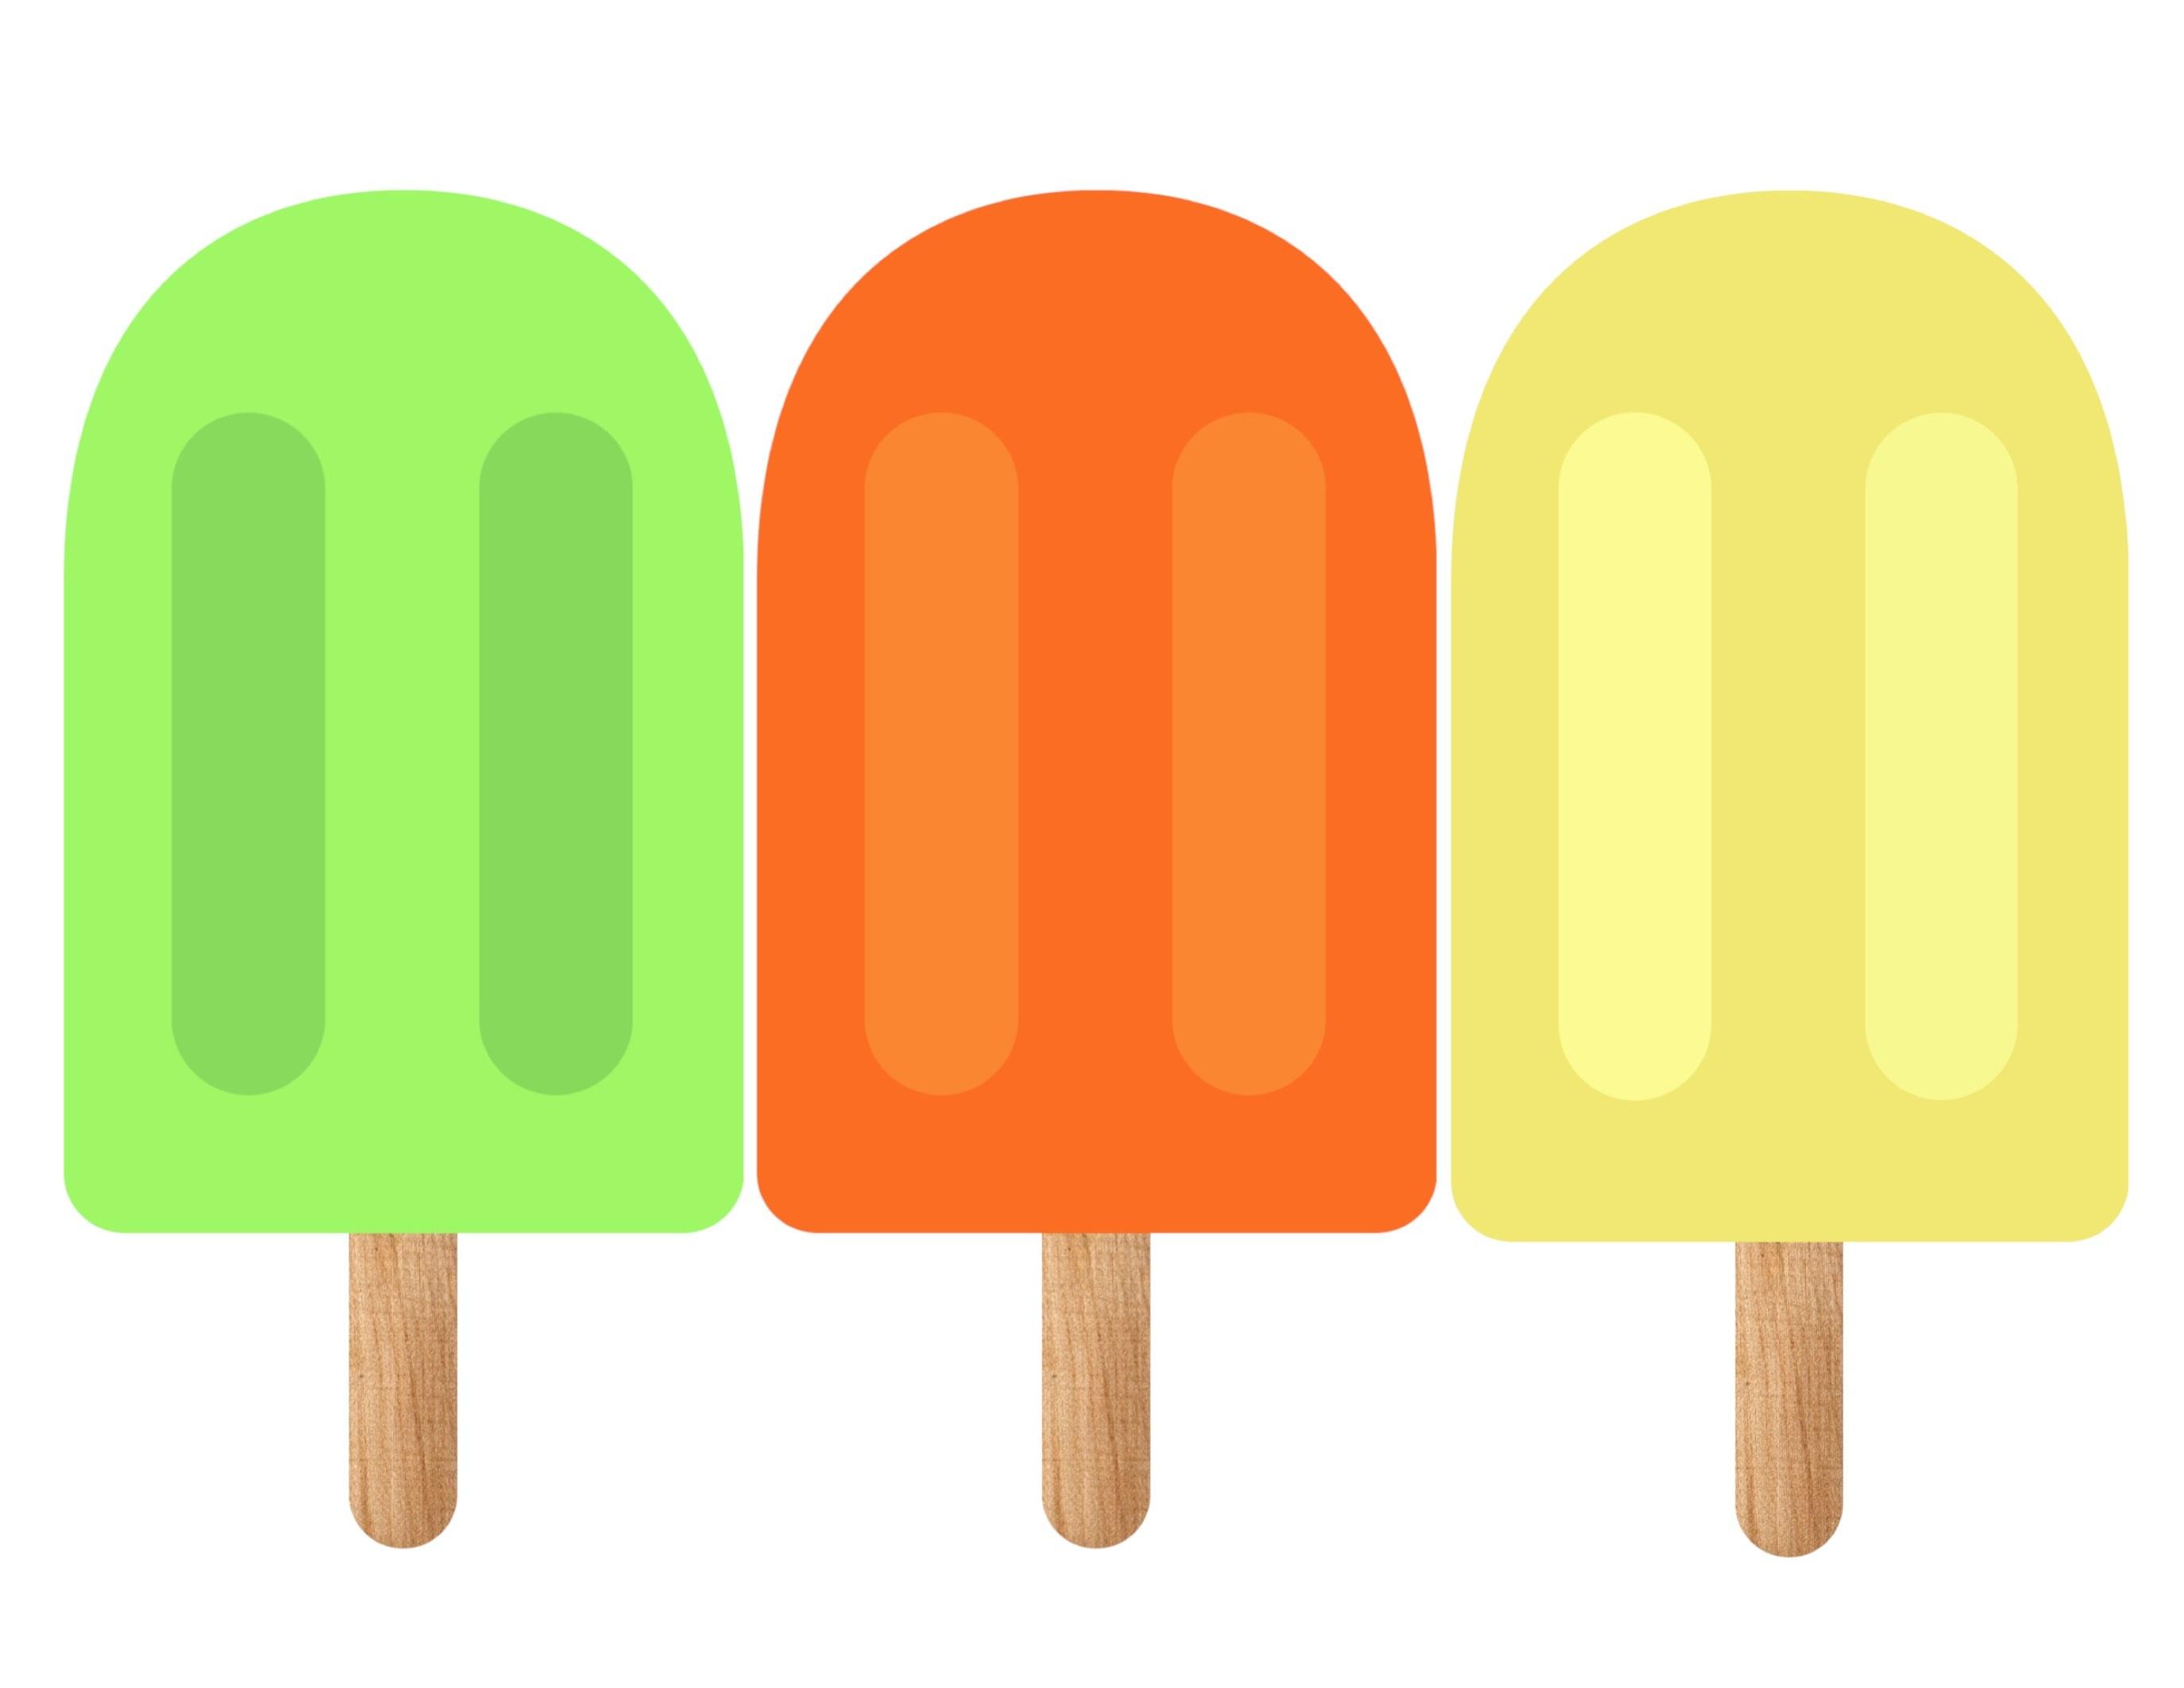 Popsicle Summer Banner Decor Free Printable - Paper Trail Design - Free Printable Popsicle Template